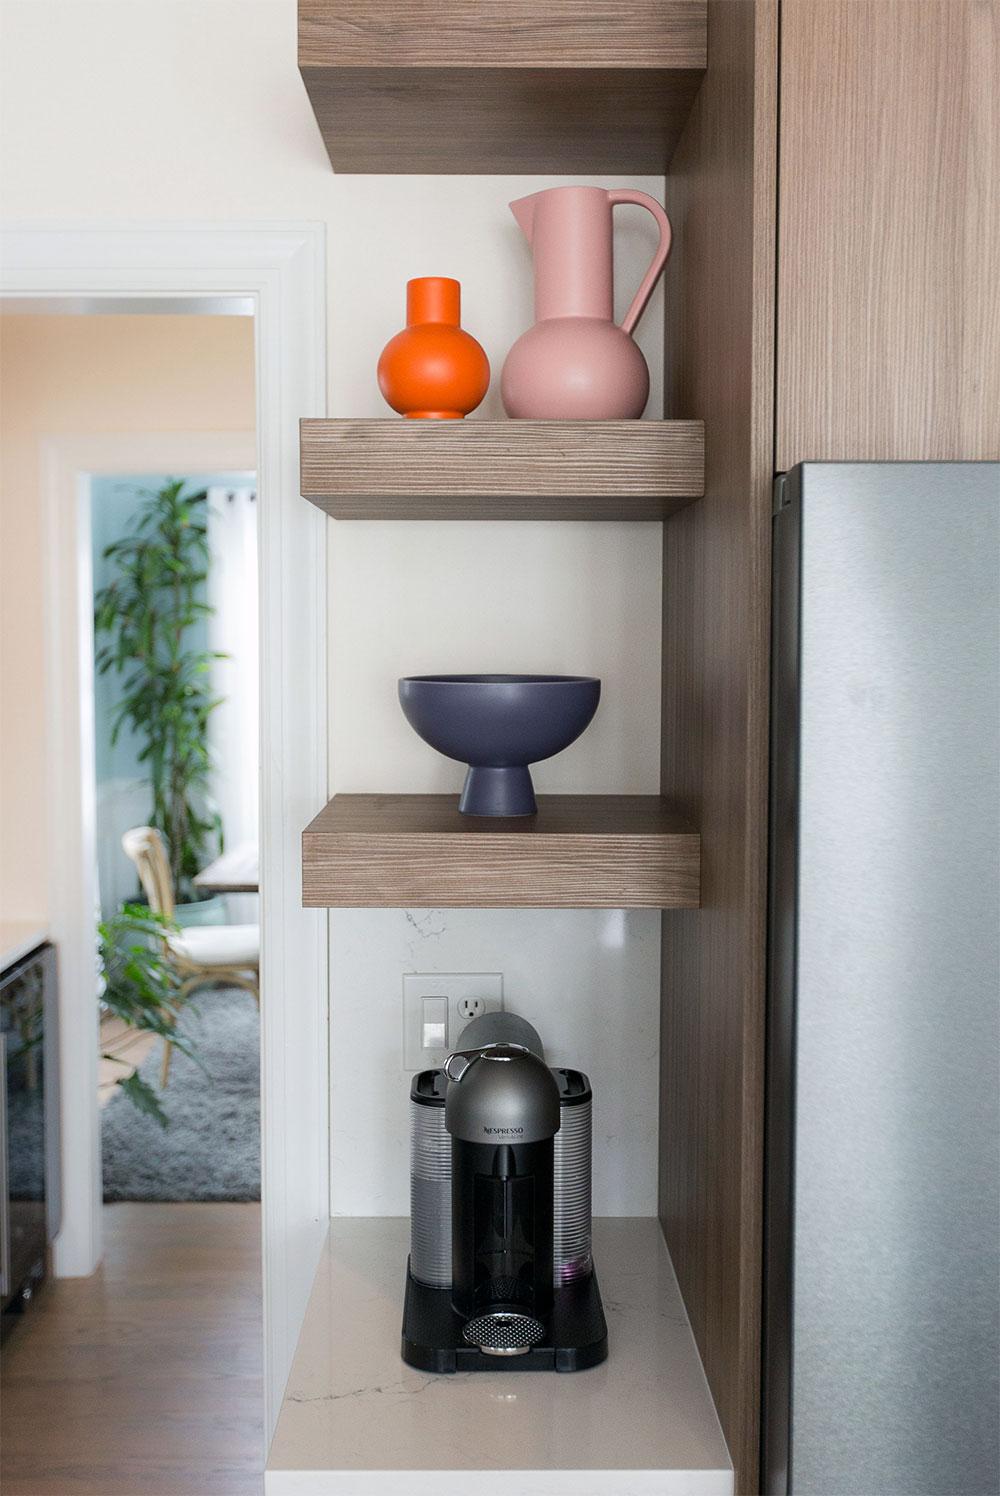 Alton Kitchen Remodel: Custom Shelving